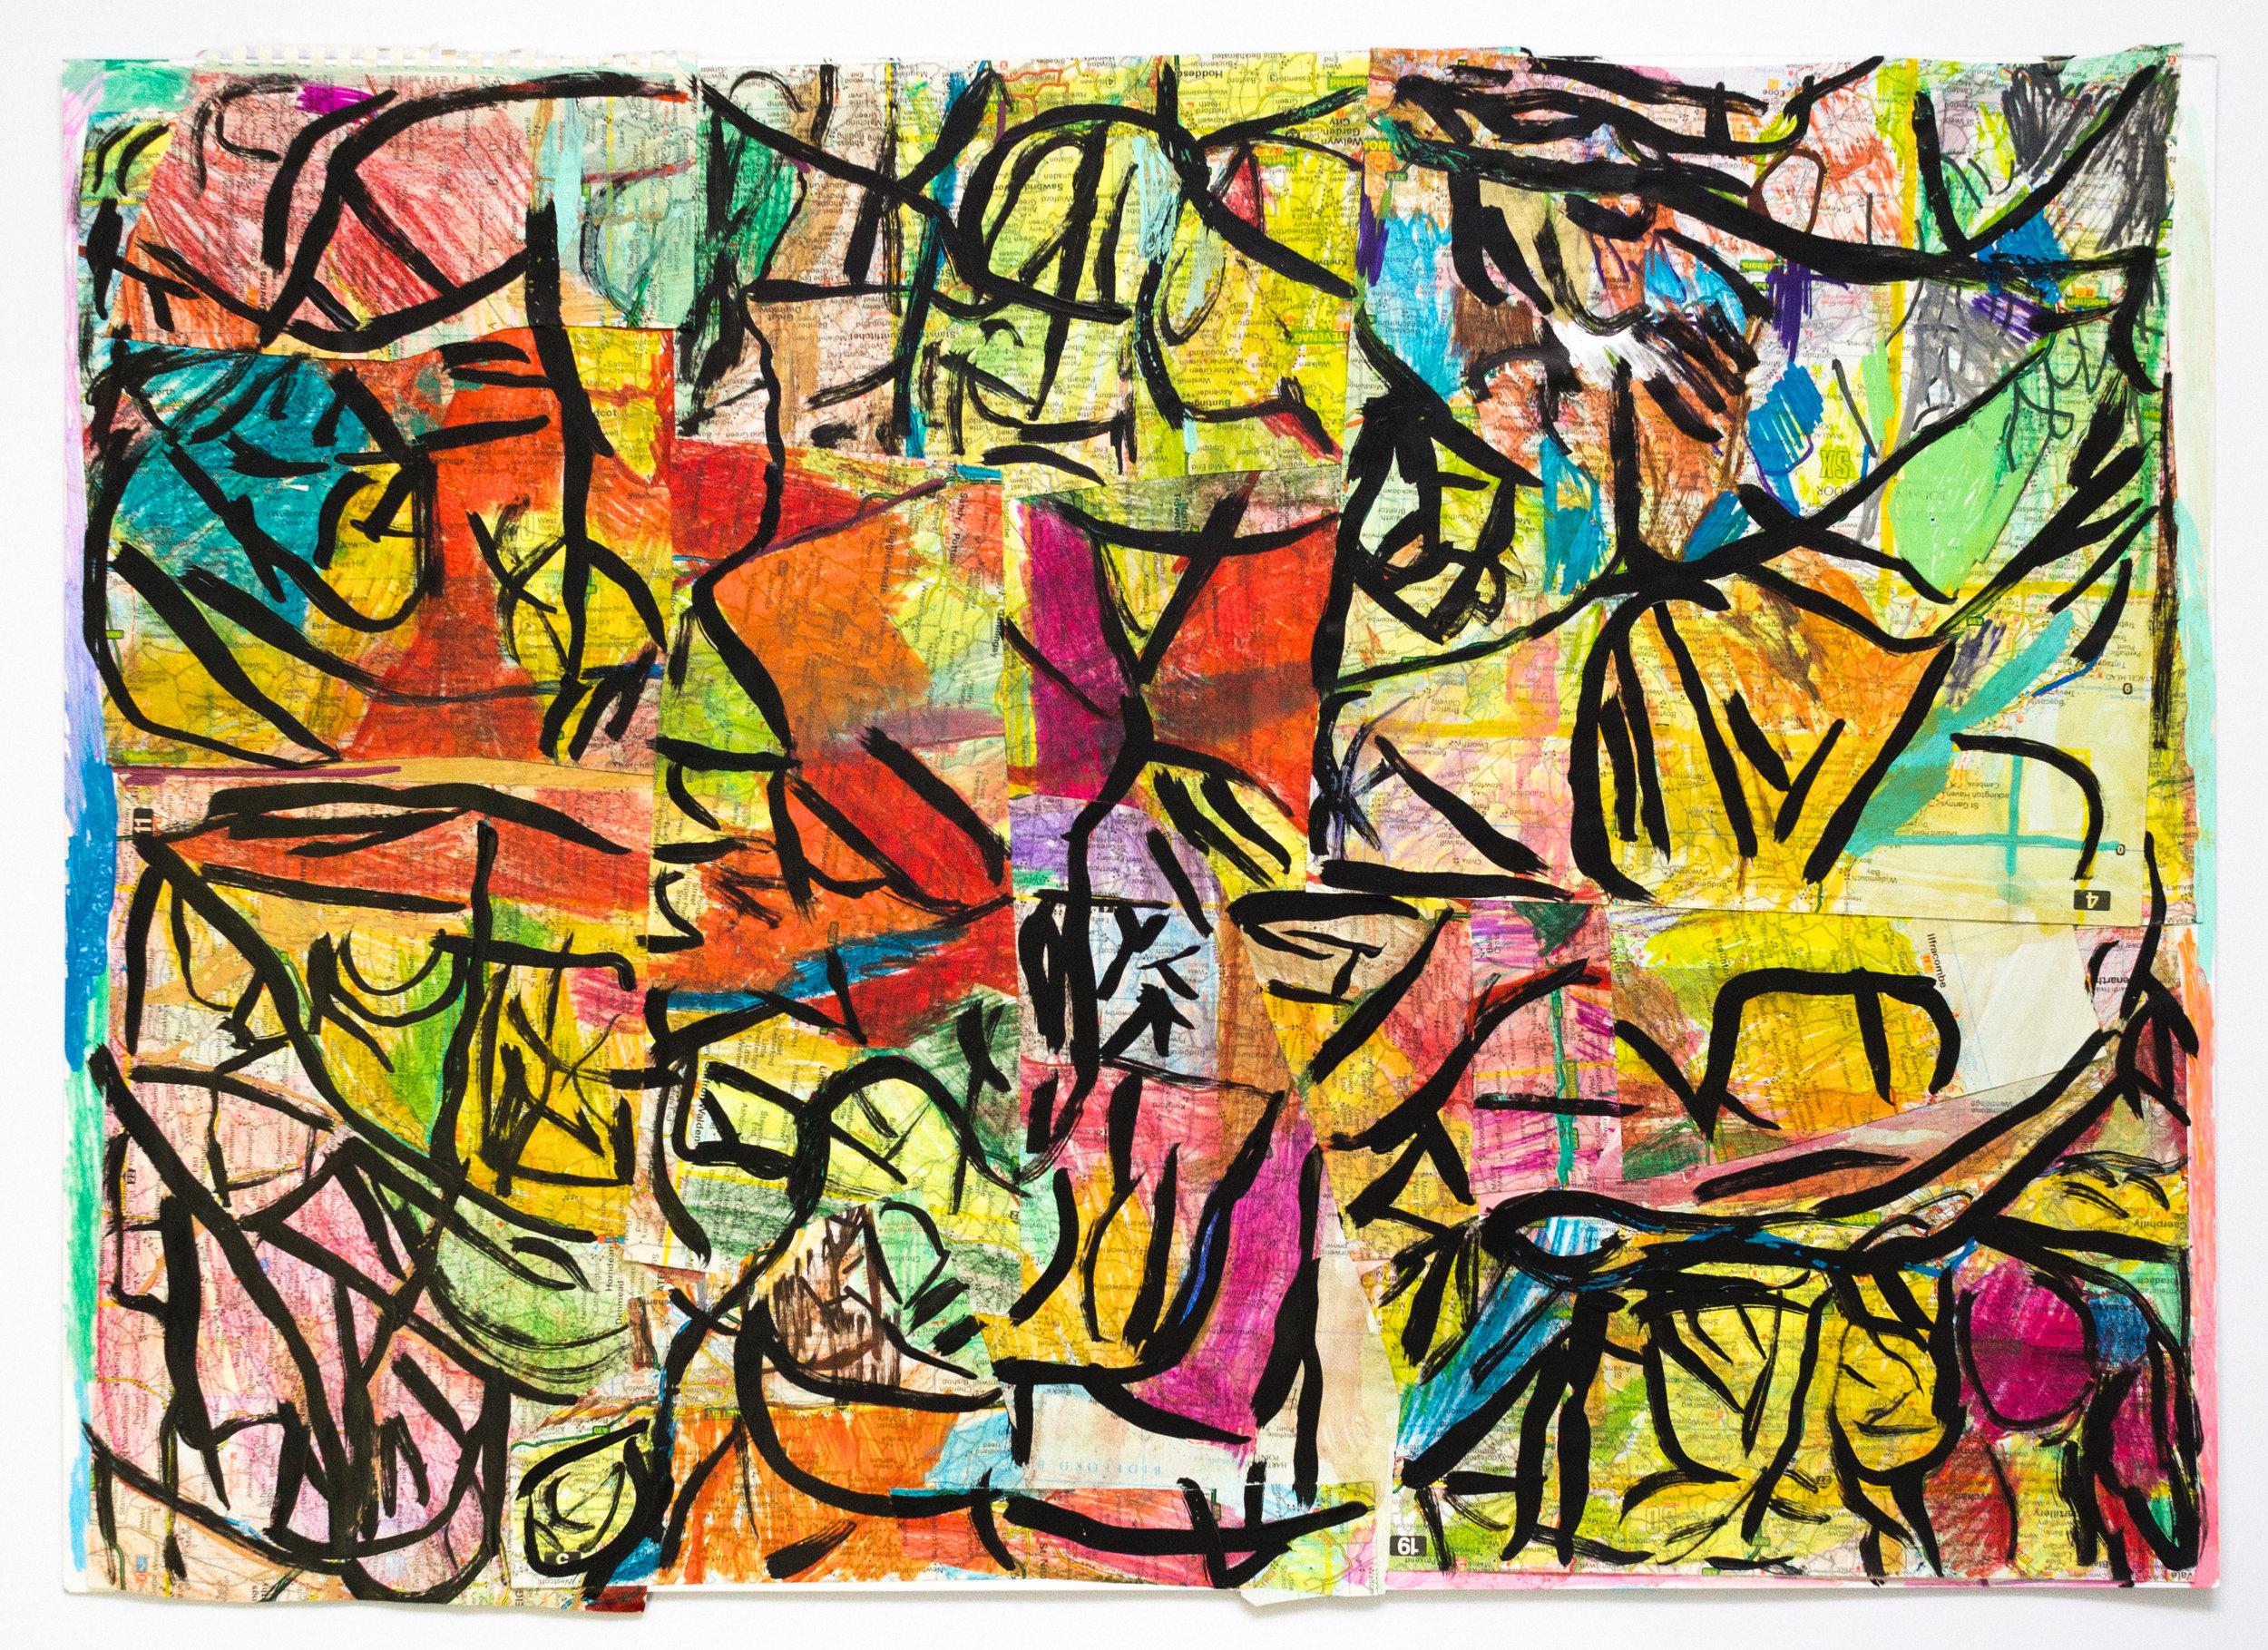 Paulino Martin, Untitled (PM 098), 2018, 20 x 27.5 inches